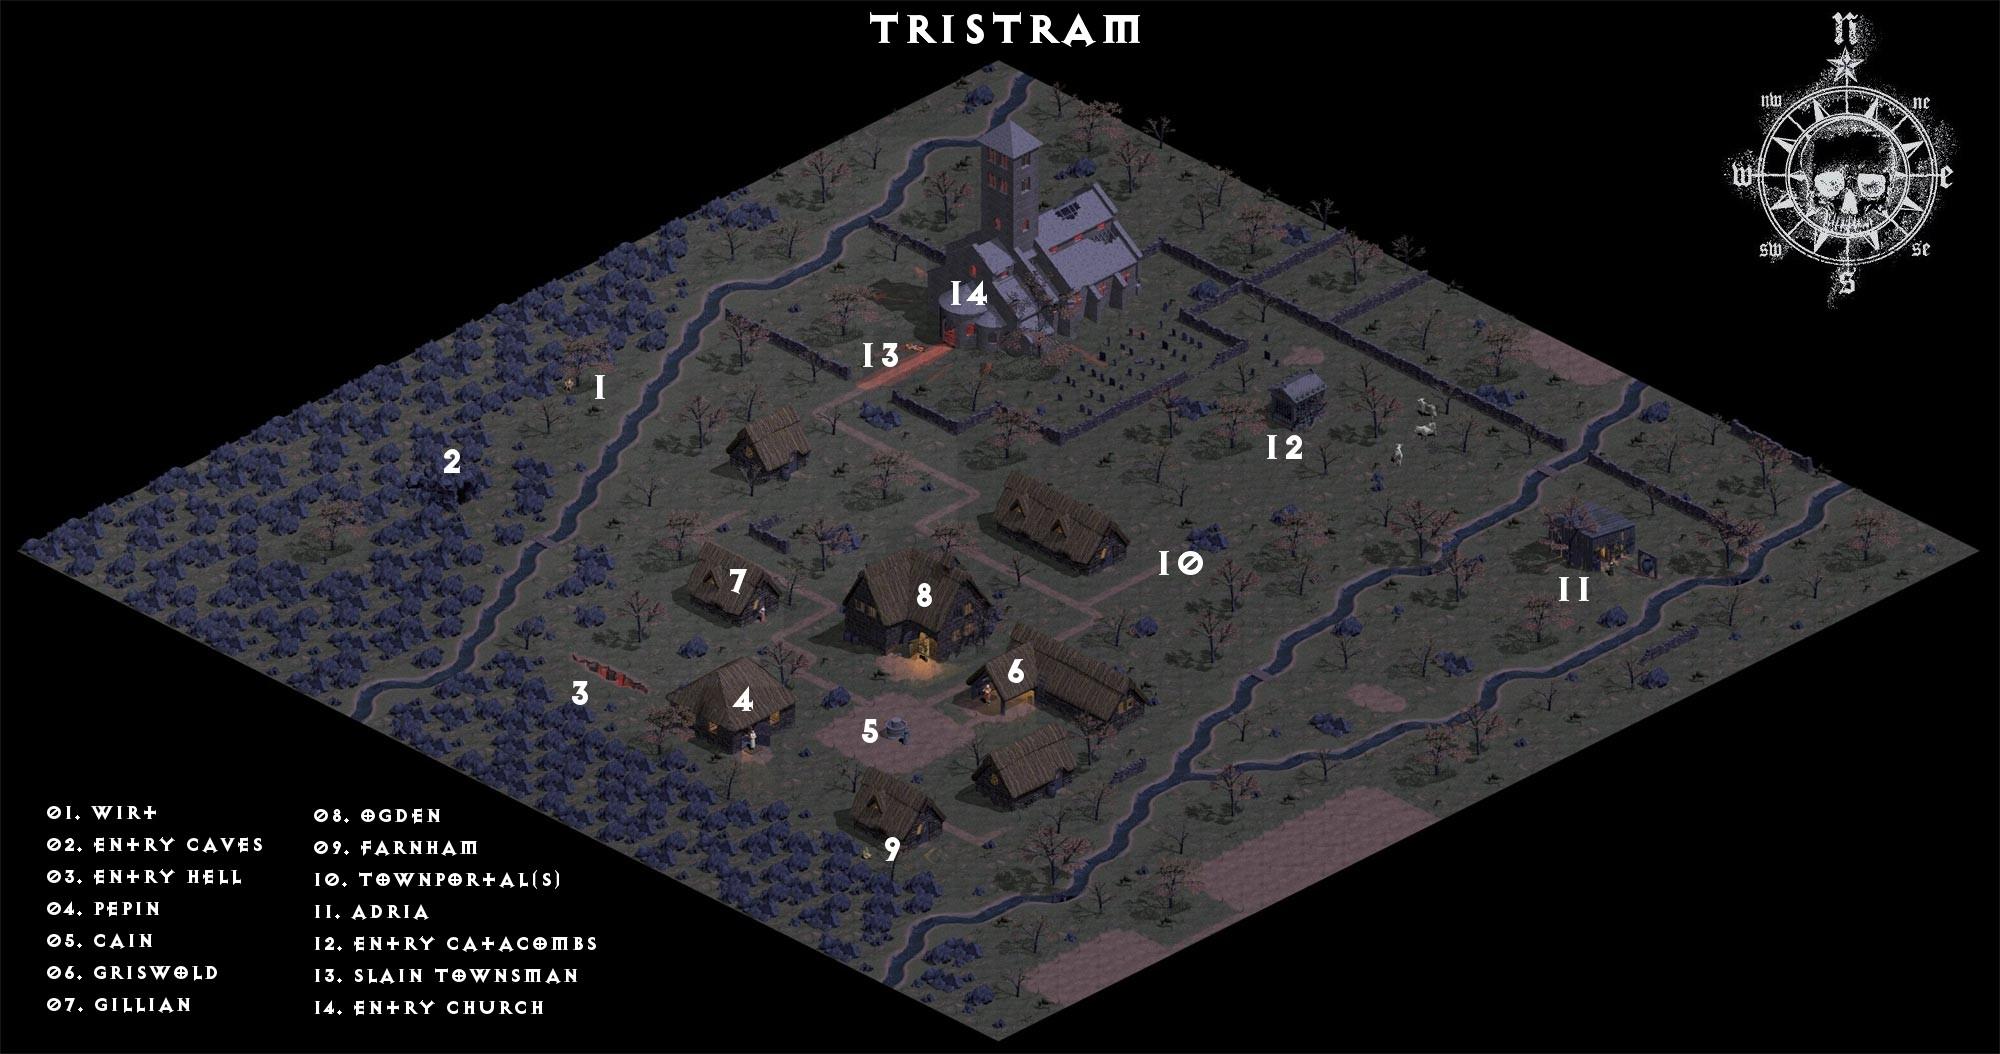 The Diablo project - Post Apoc Wargames